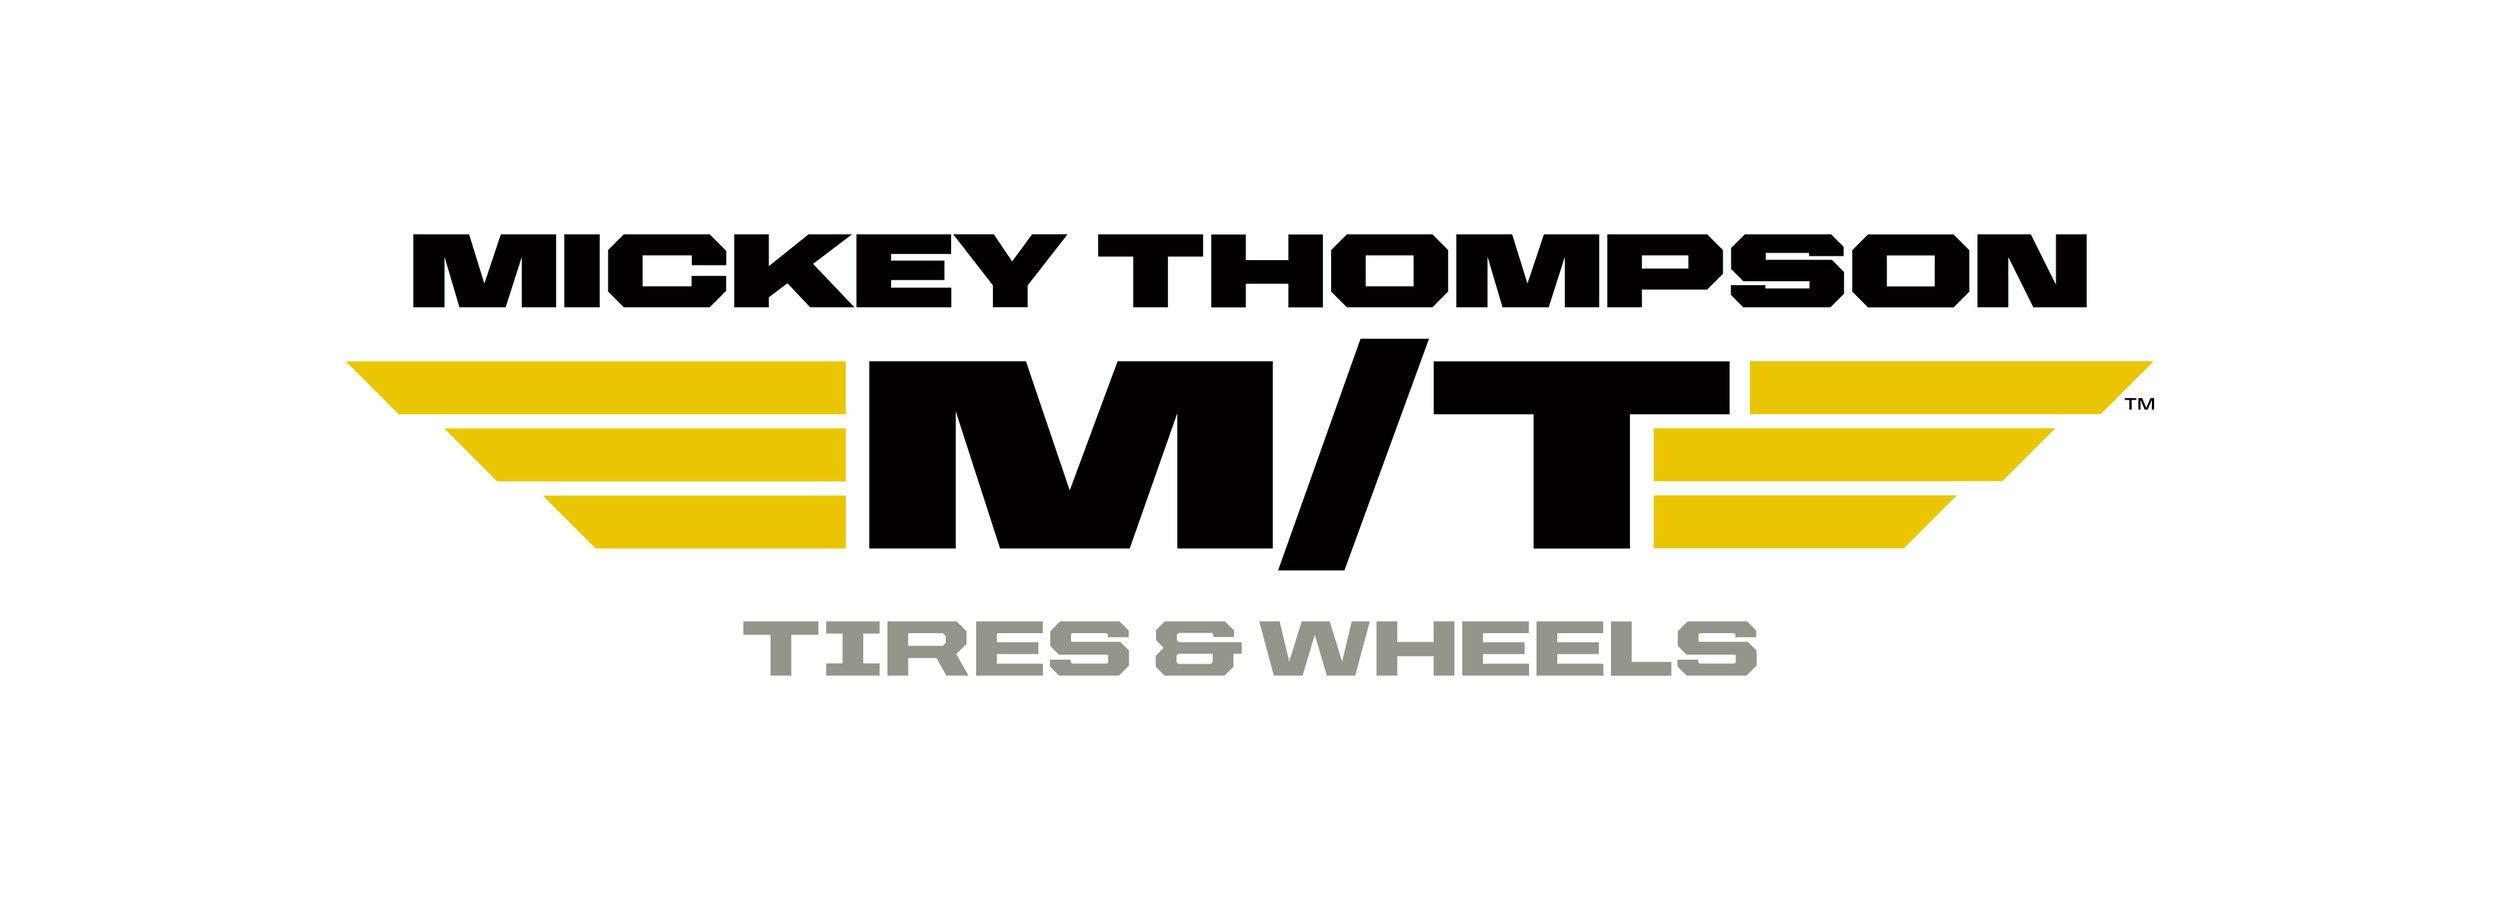 Mickey Thompson Tires & Wheels